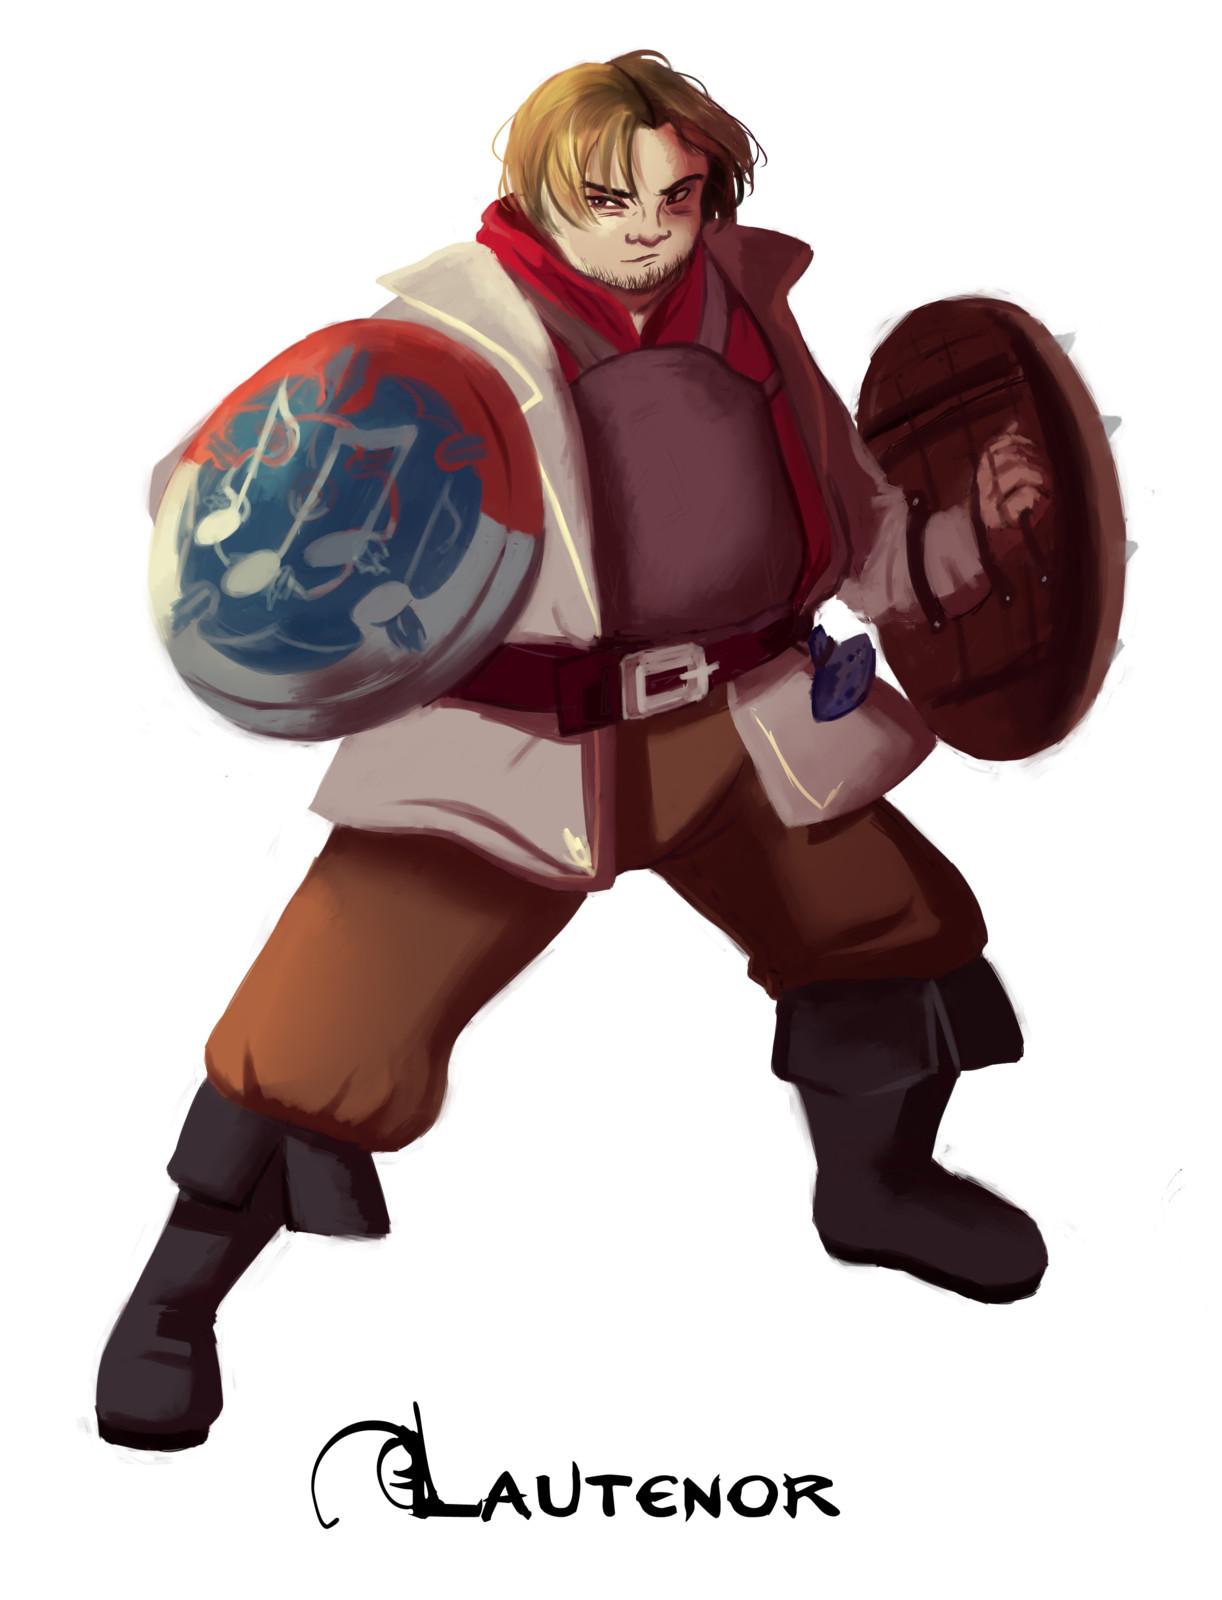 Character design: Lautenor